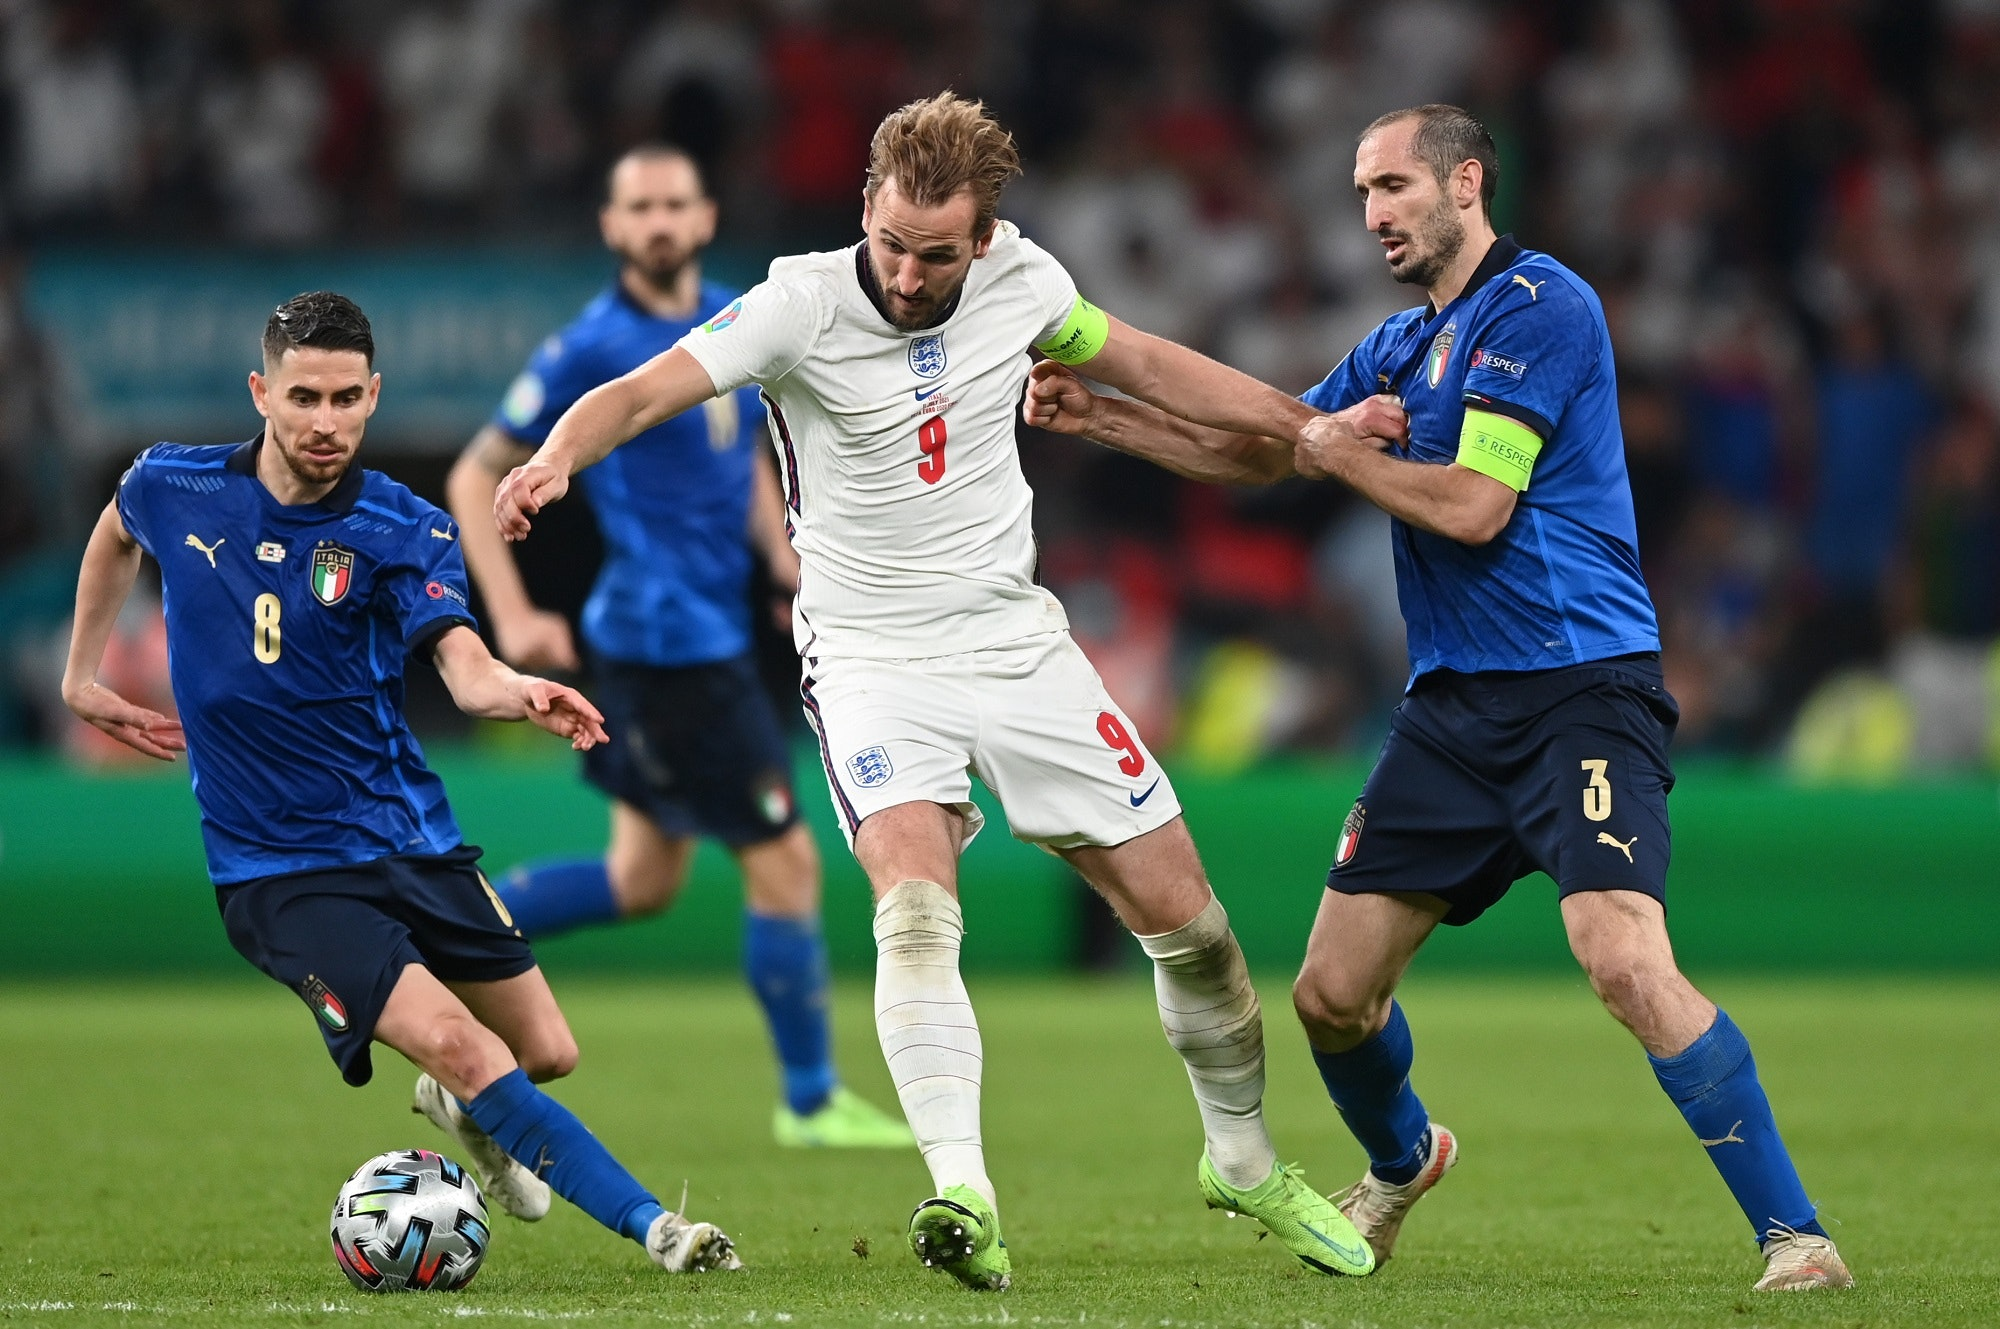 Finał EURO 2020. Anglia - Włochy